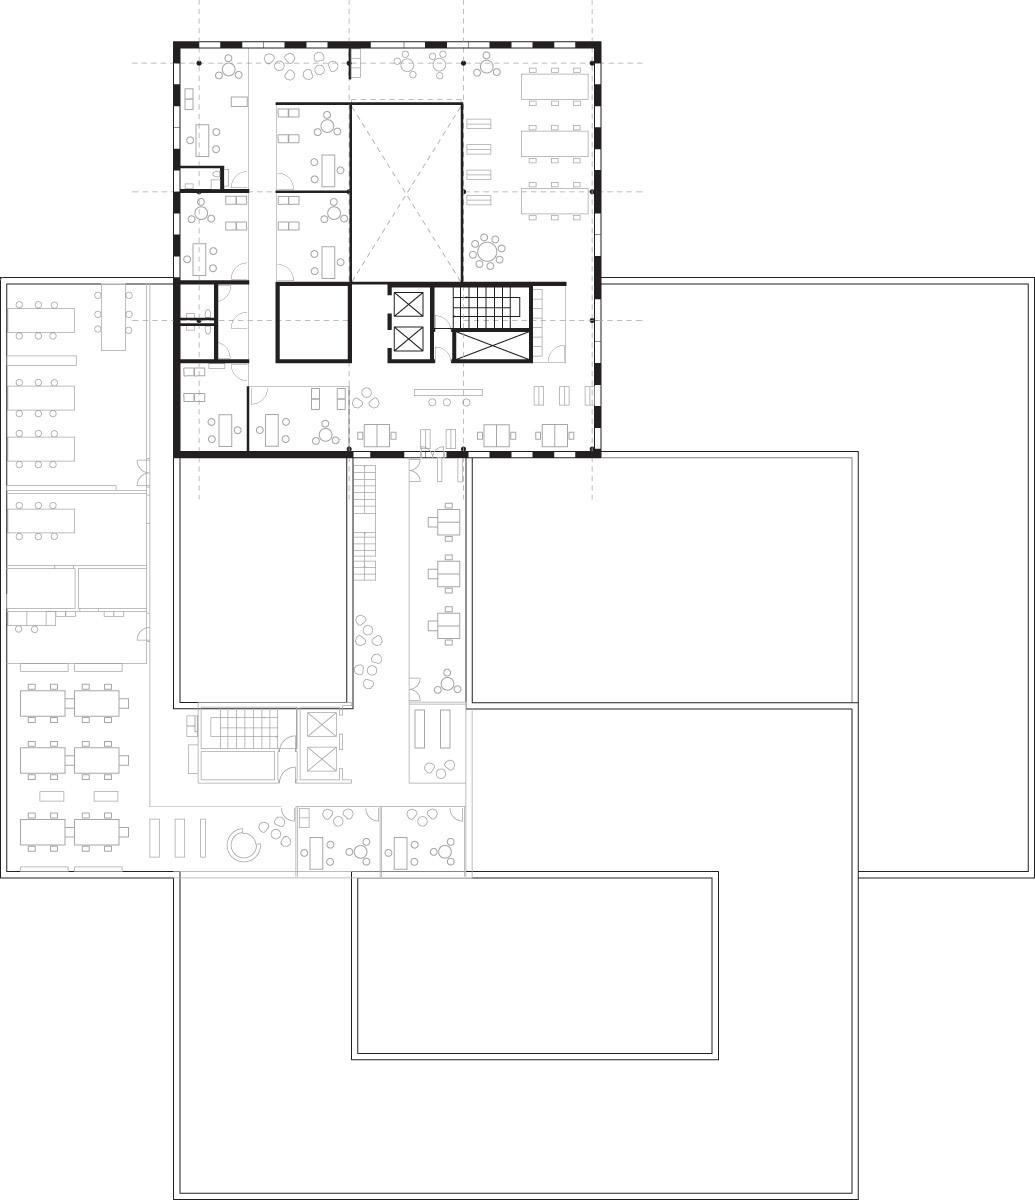 ZSW 03 PLAN (Image: Henning Larsen Architects)